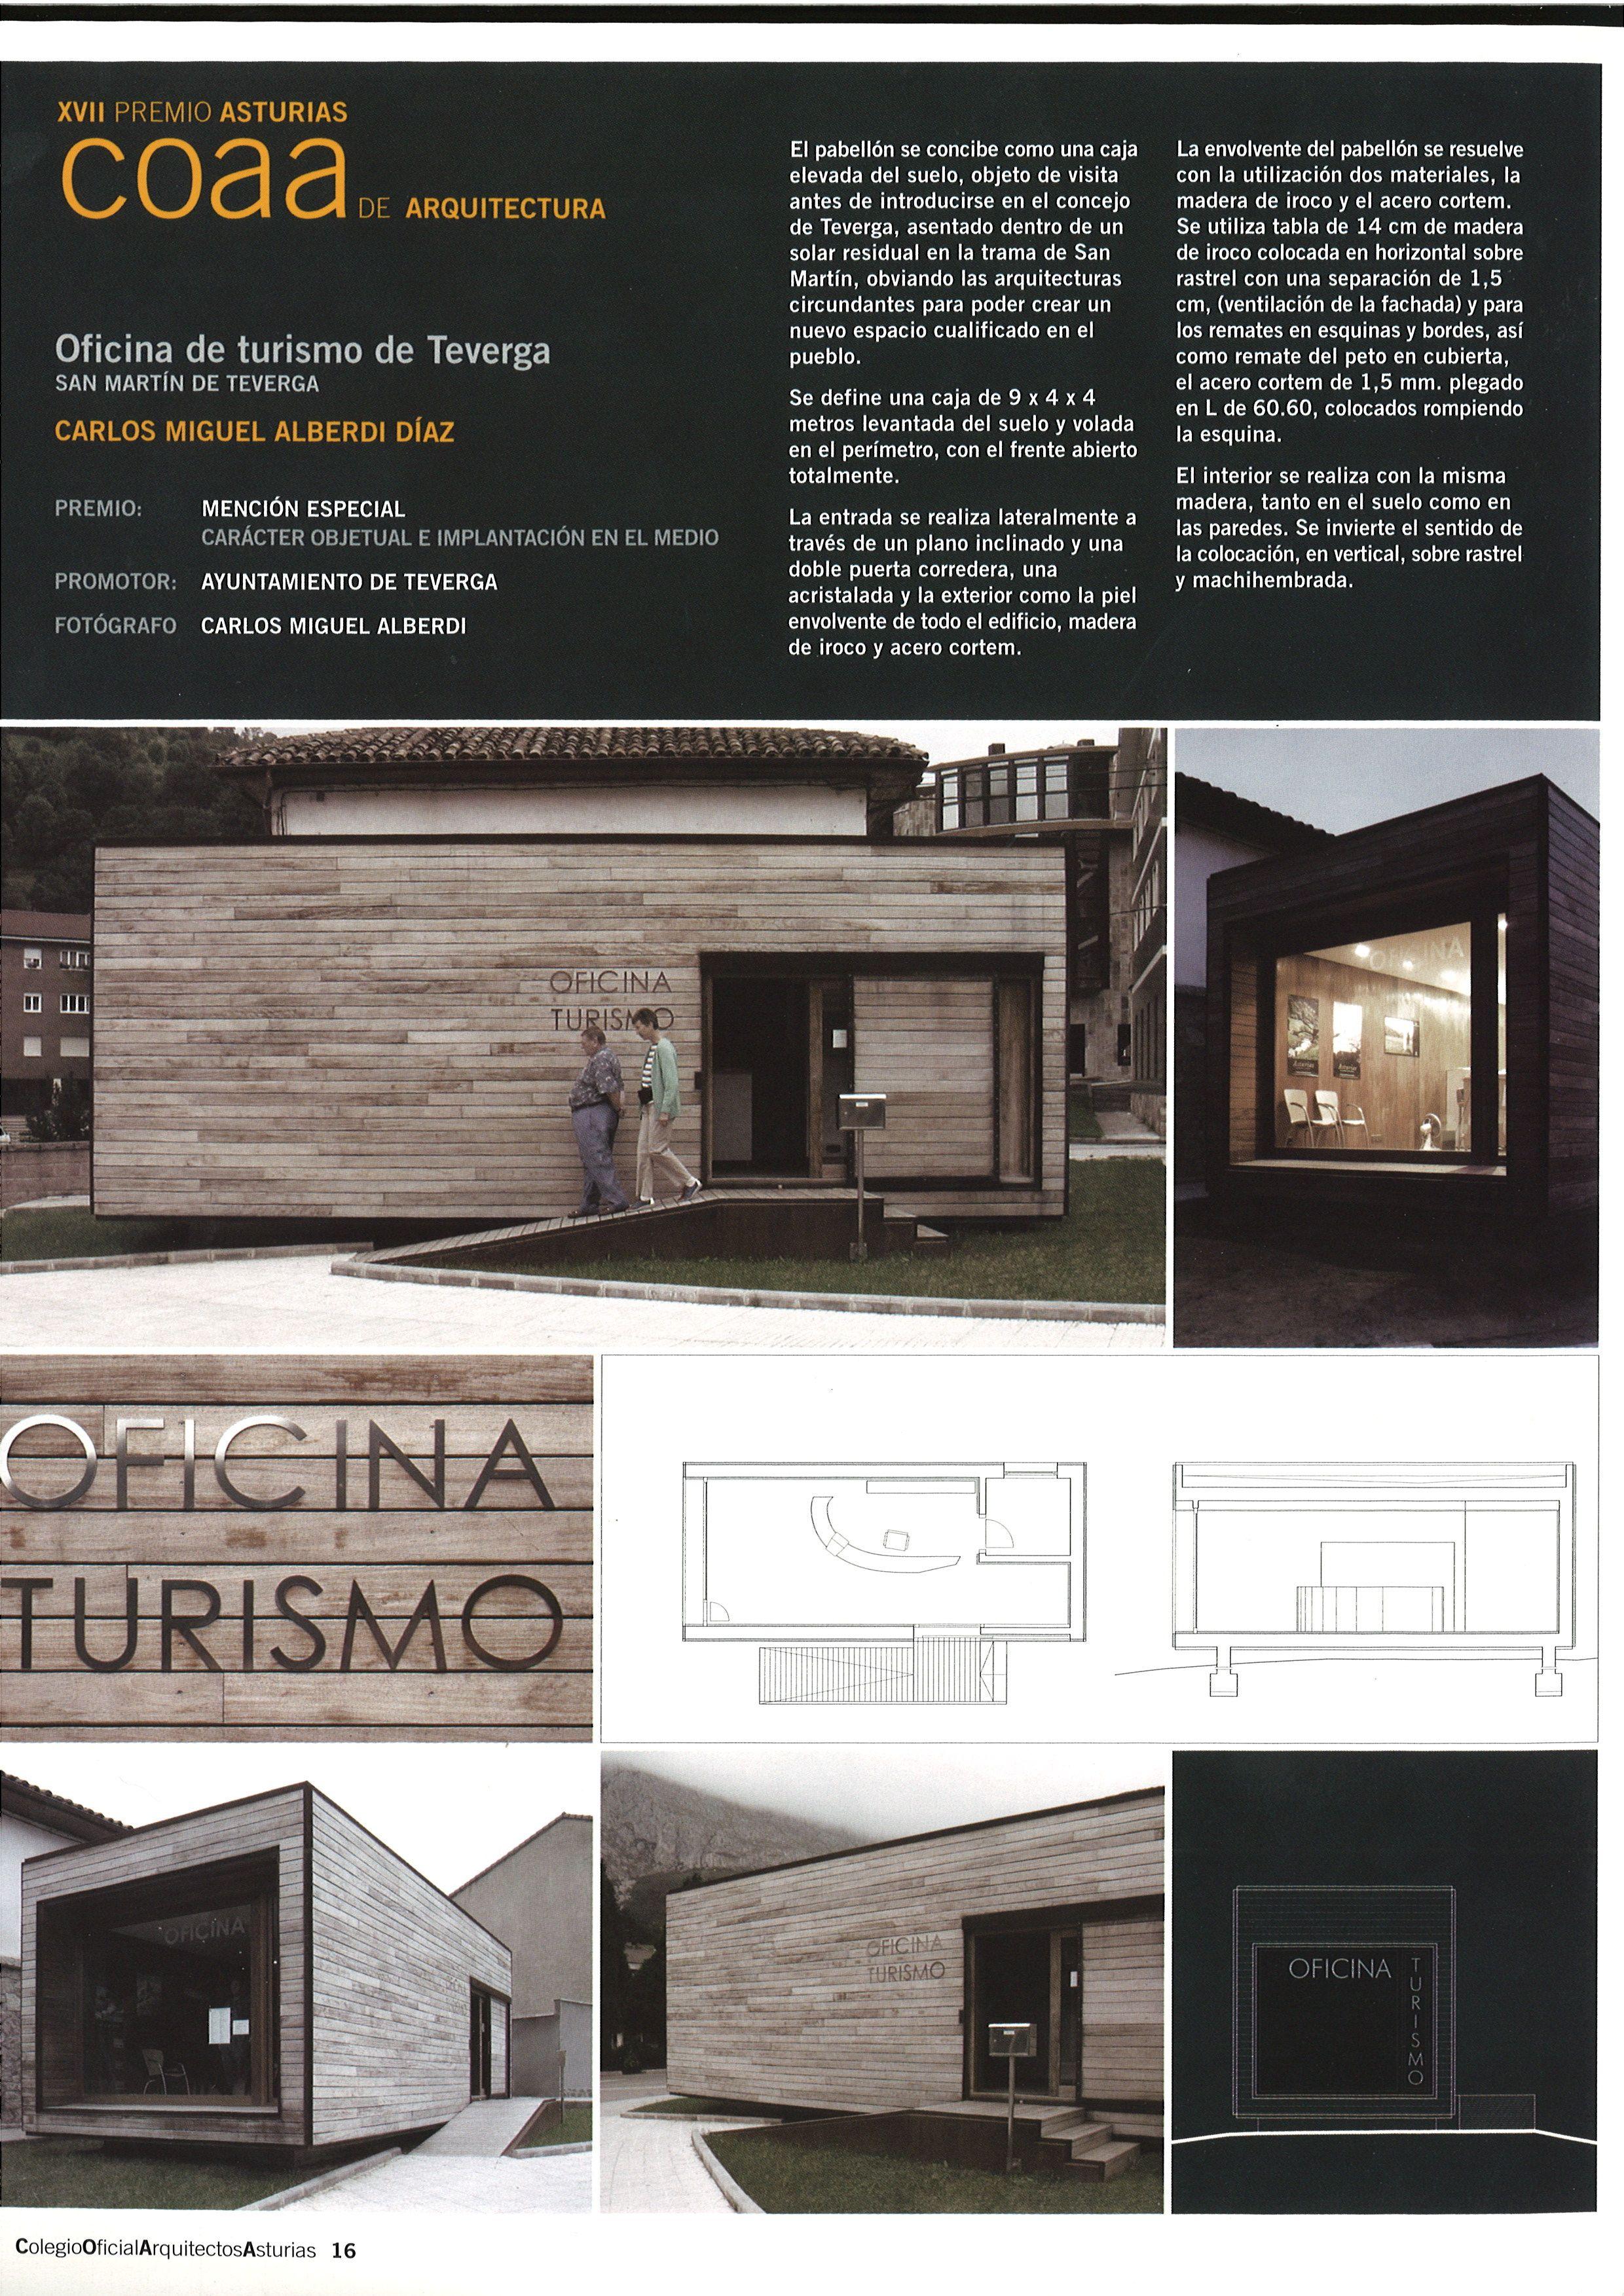 Xvii premio asturias de arquitectura 2004 menci n for Oficina de turismo asturias